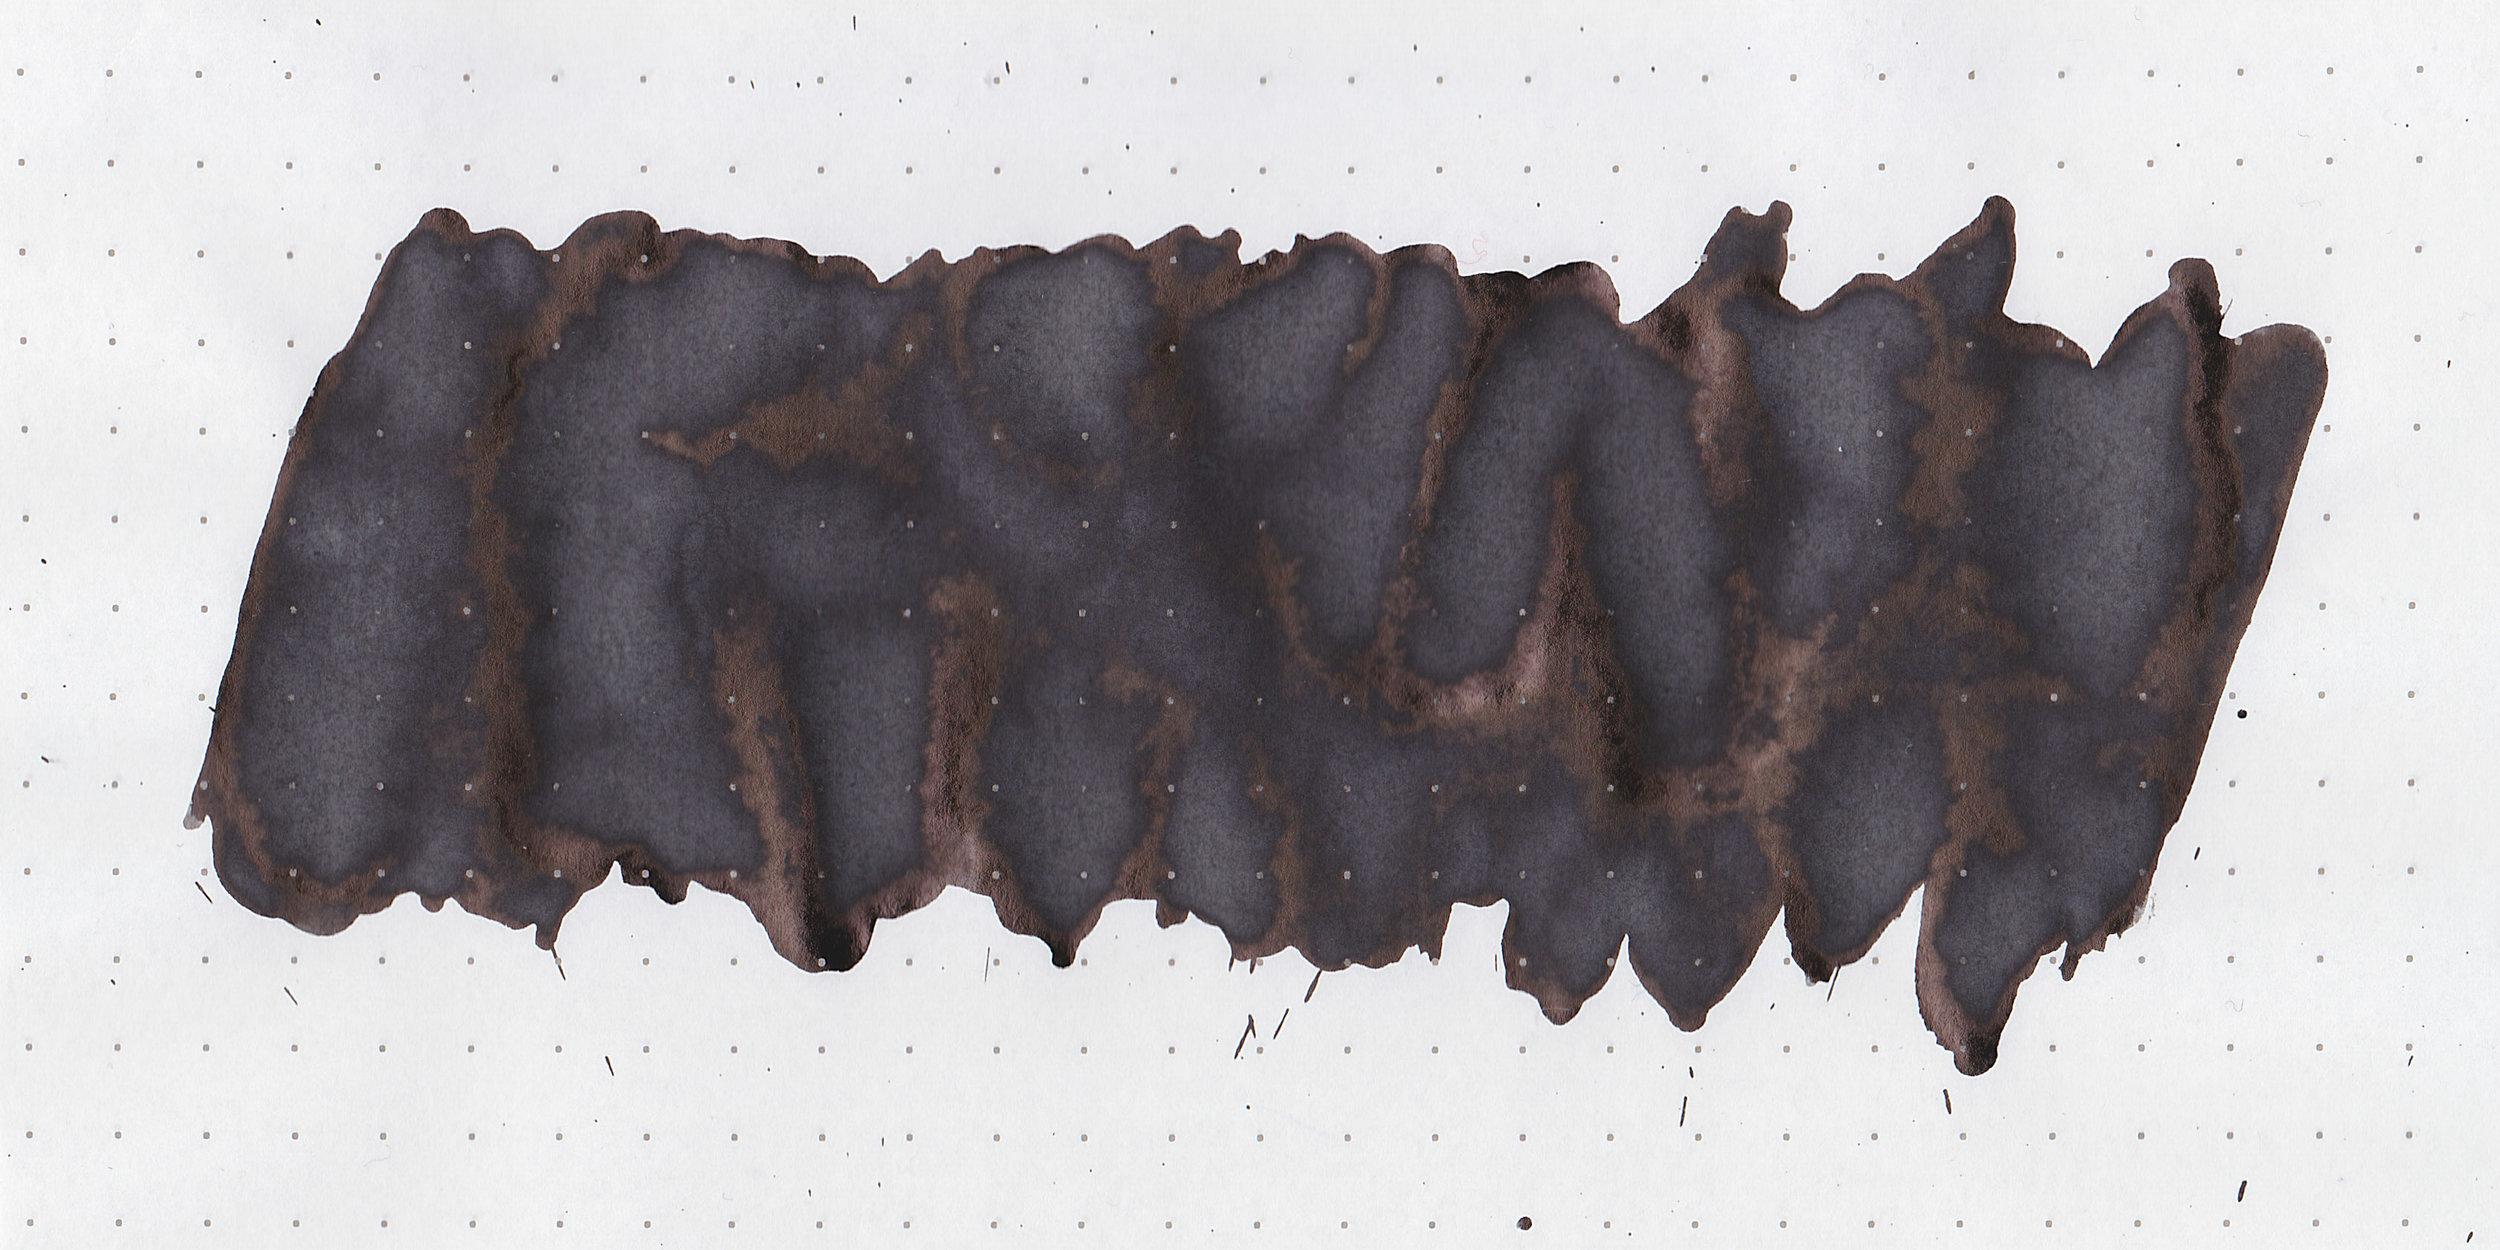 jh-noir-abyssal-11.jpg